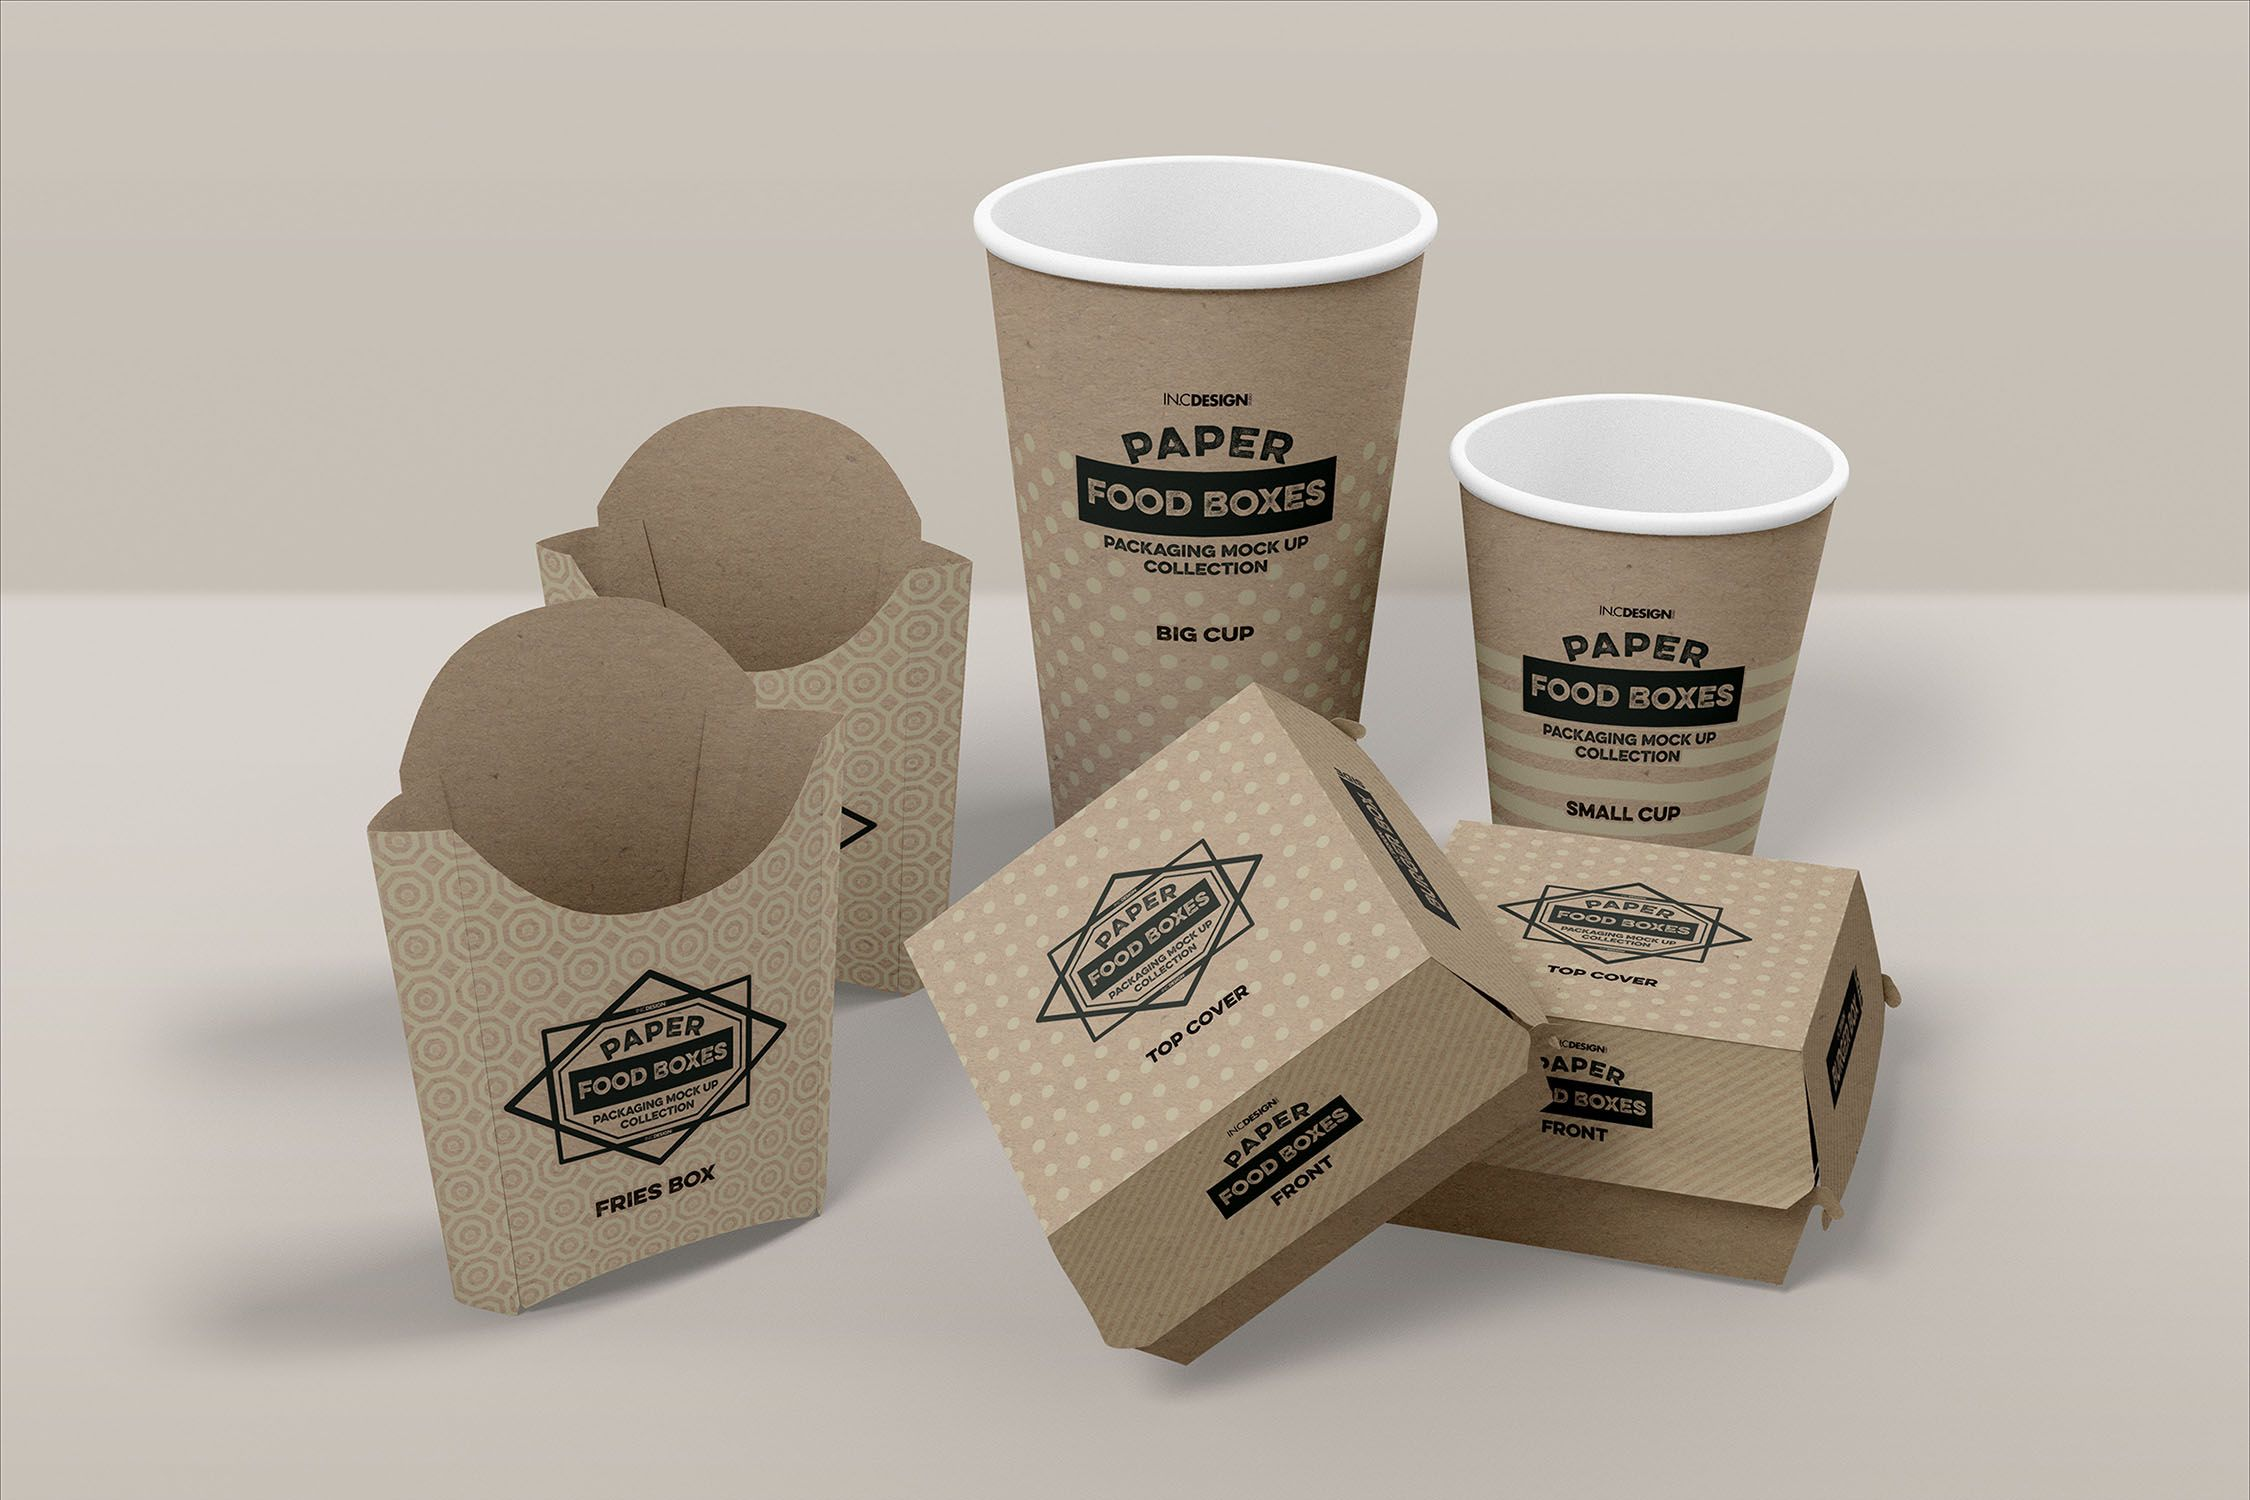 Download Fast Food Branding And Packaging Free Mockup Template 5400 X 3600 Pixels 300 Dpi Psd Burgerbox Frenchfrybox Packaging Mockup Free Fast Food Food Mockup